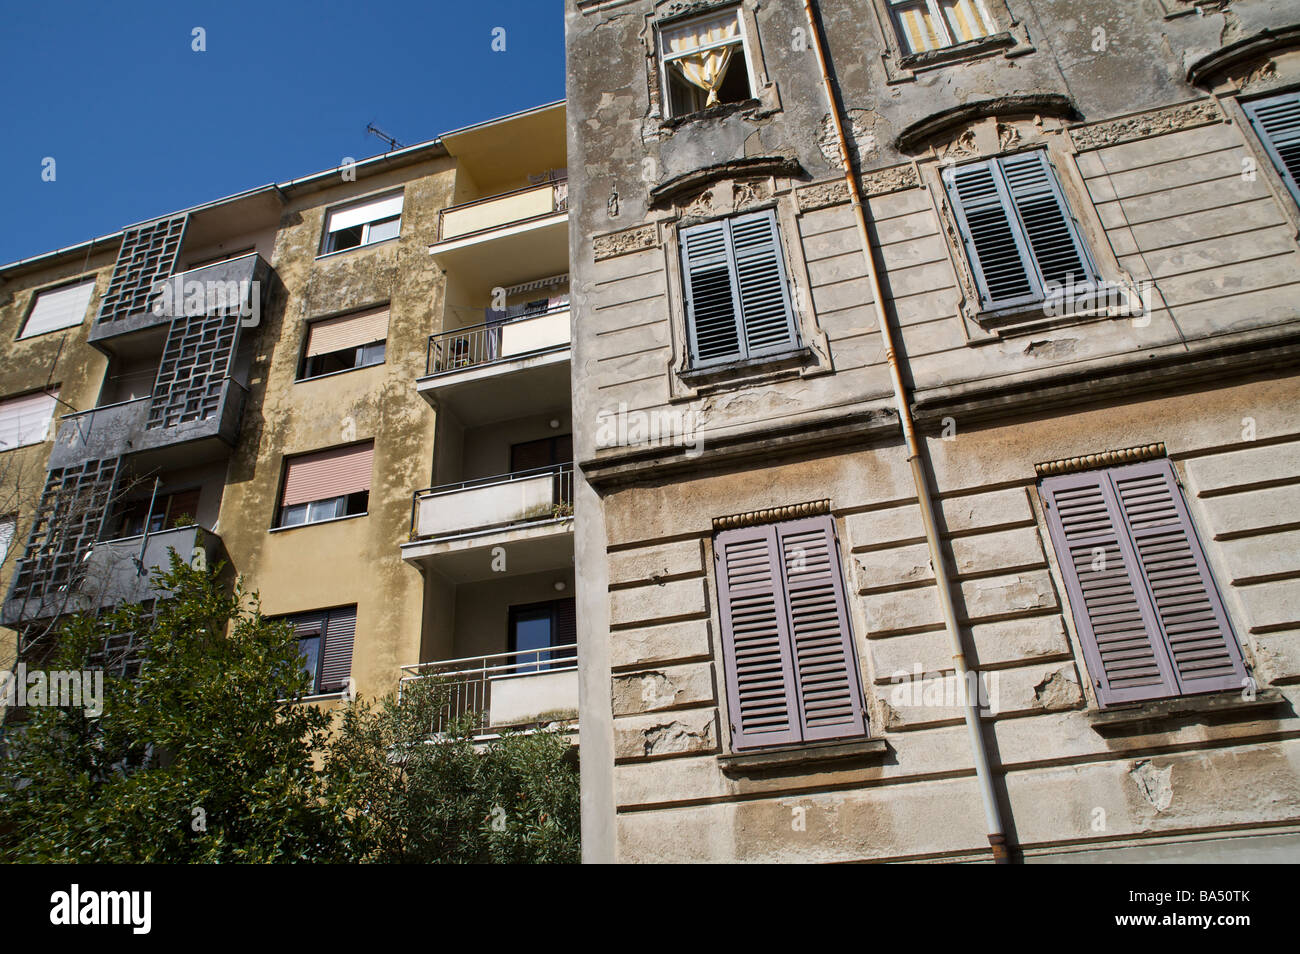 apartment buildings in Pula, Istria, Croatia - Stock Image